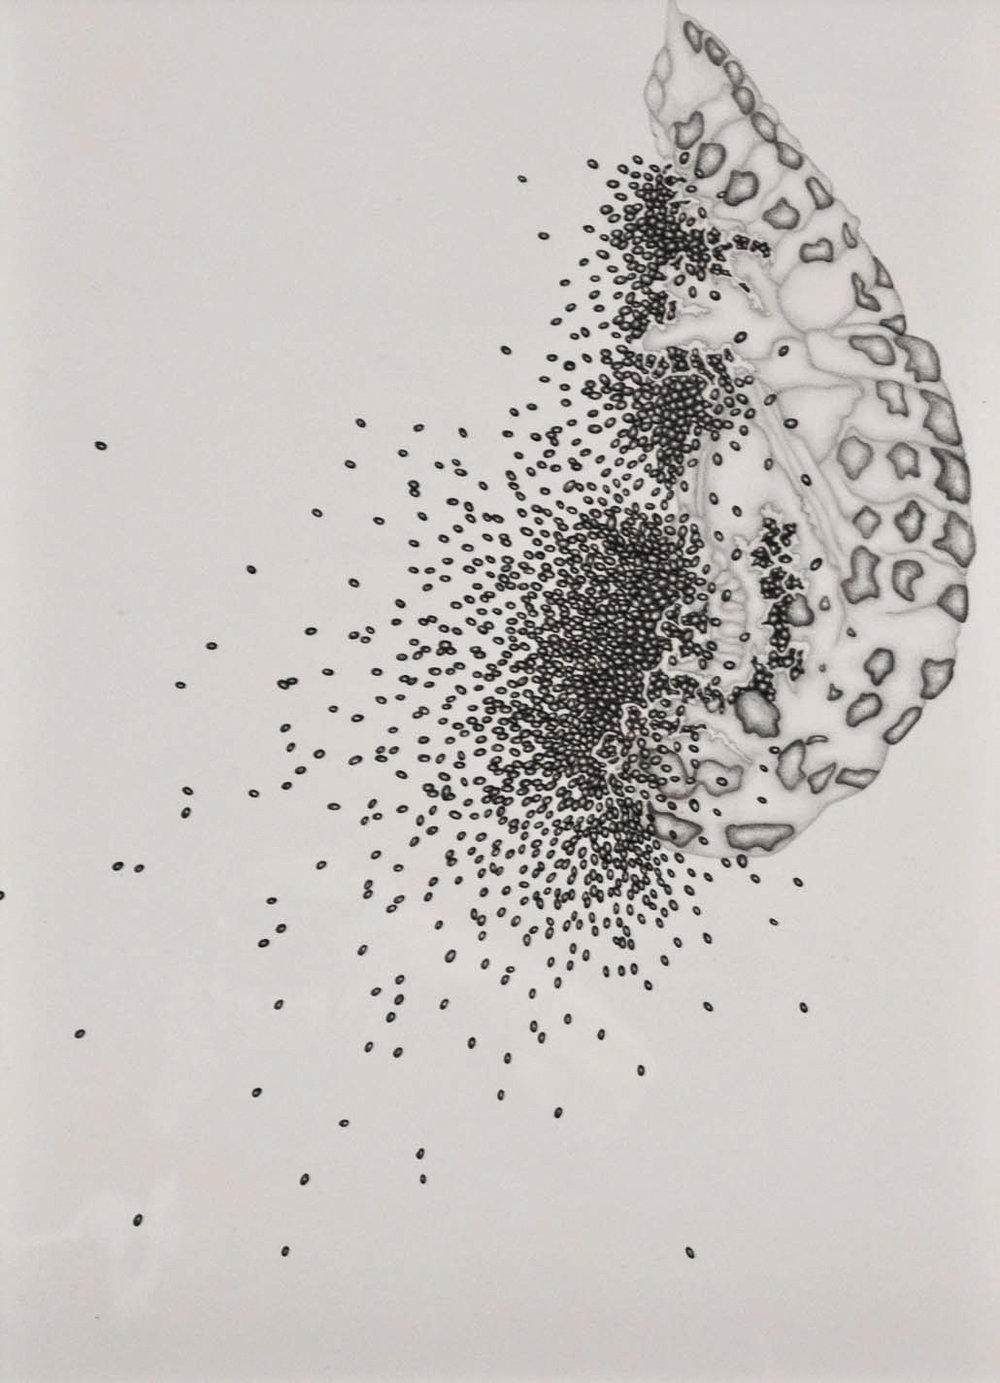 Chrysalis 002,  2013. 50cmx35cm. Pencil on Fabriano paper.